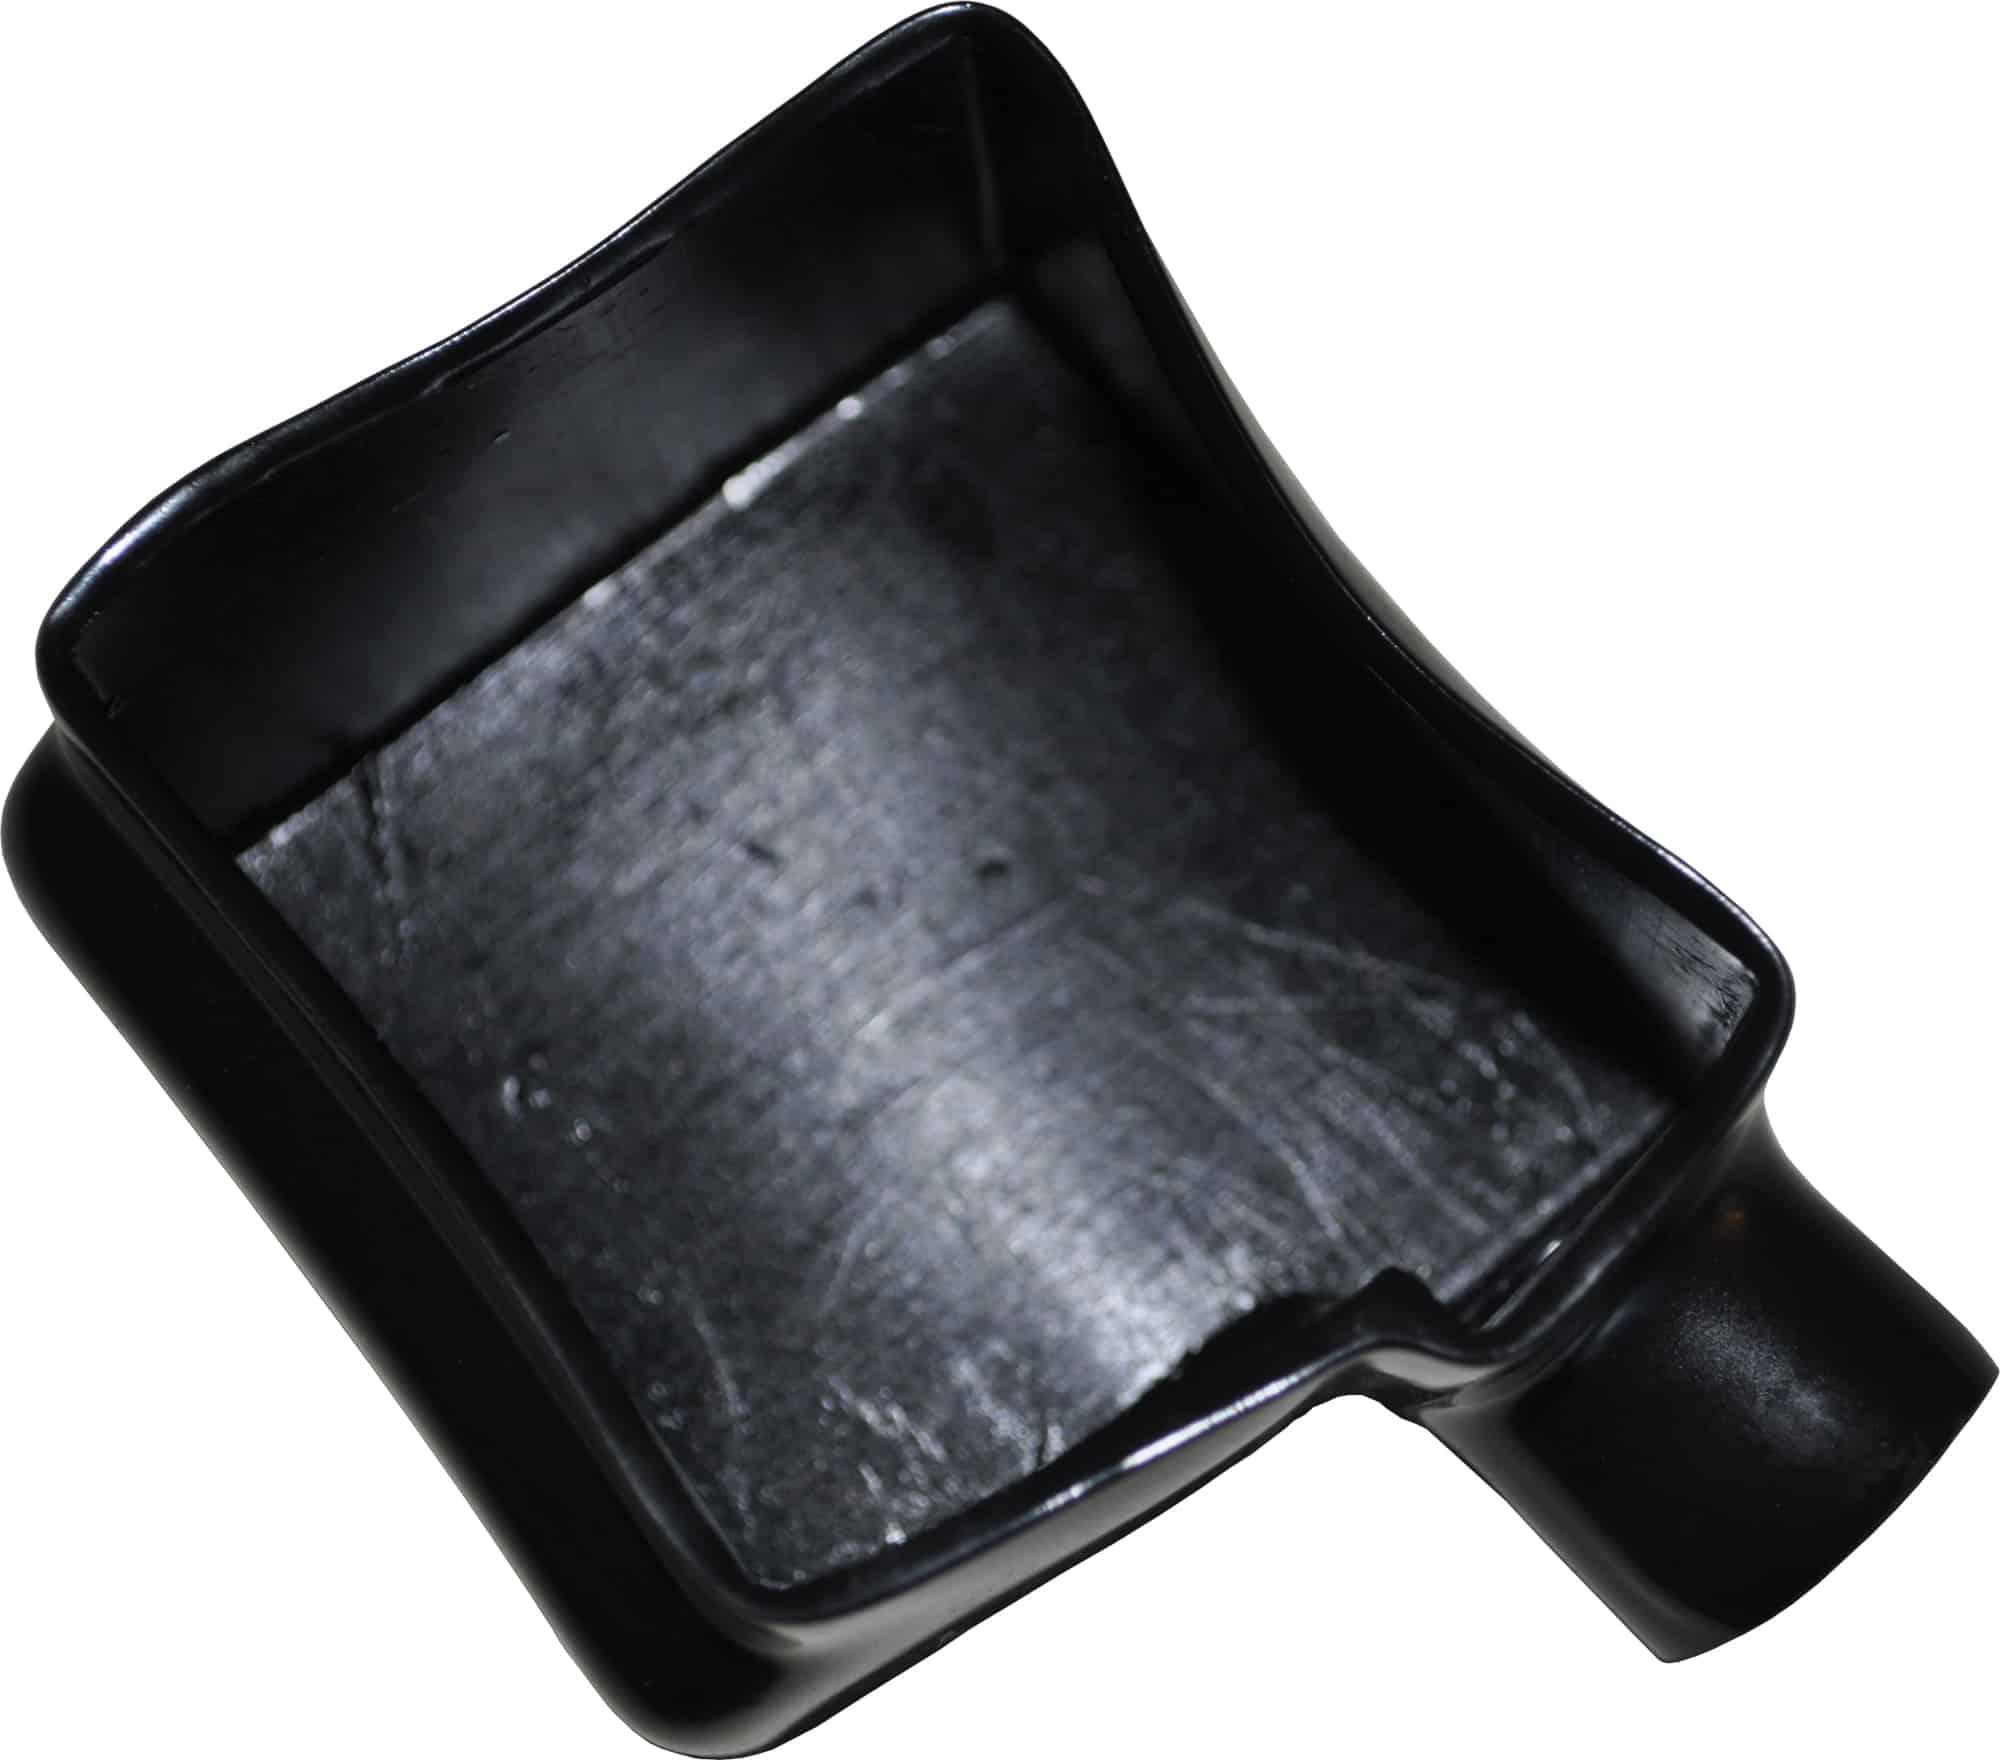 Kappe hætte beskytter til batteri polsko batteripol sort bil lastbil motorcykel scooter traktor camping beskyttelseskappe støvkappe 020295N RACO